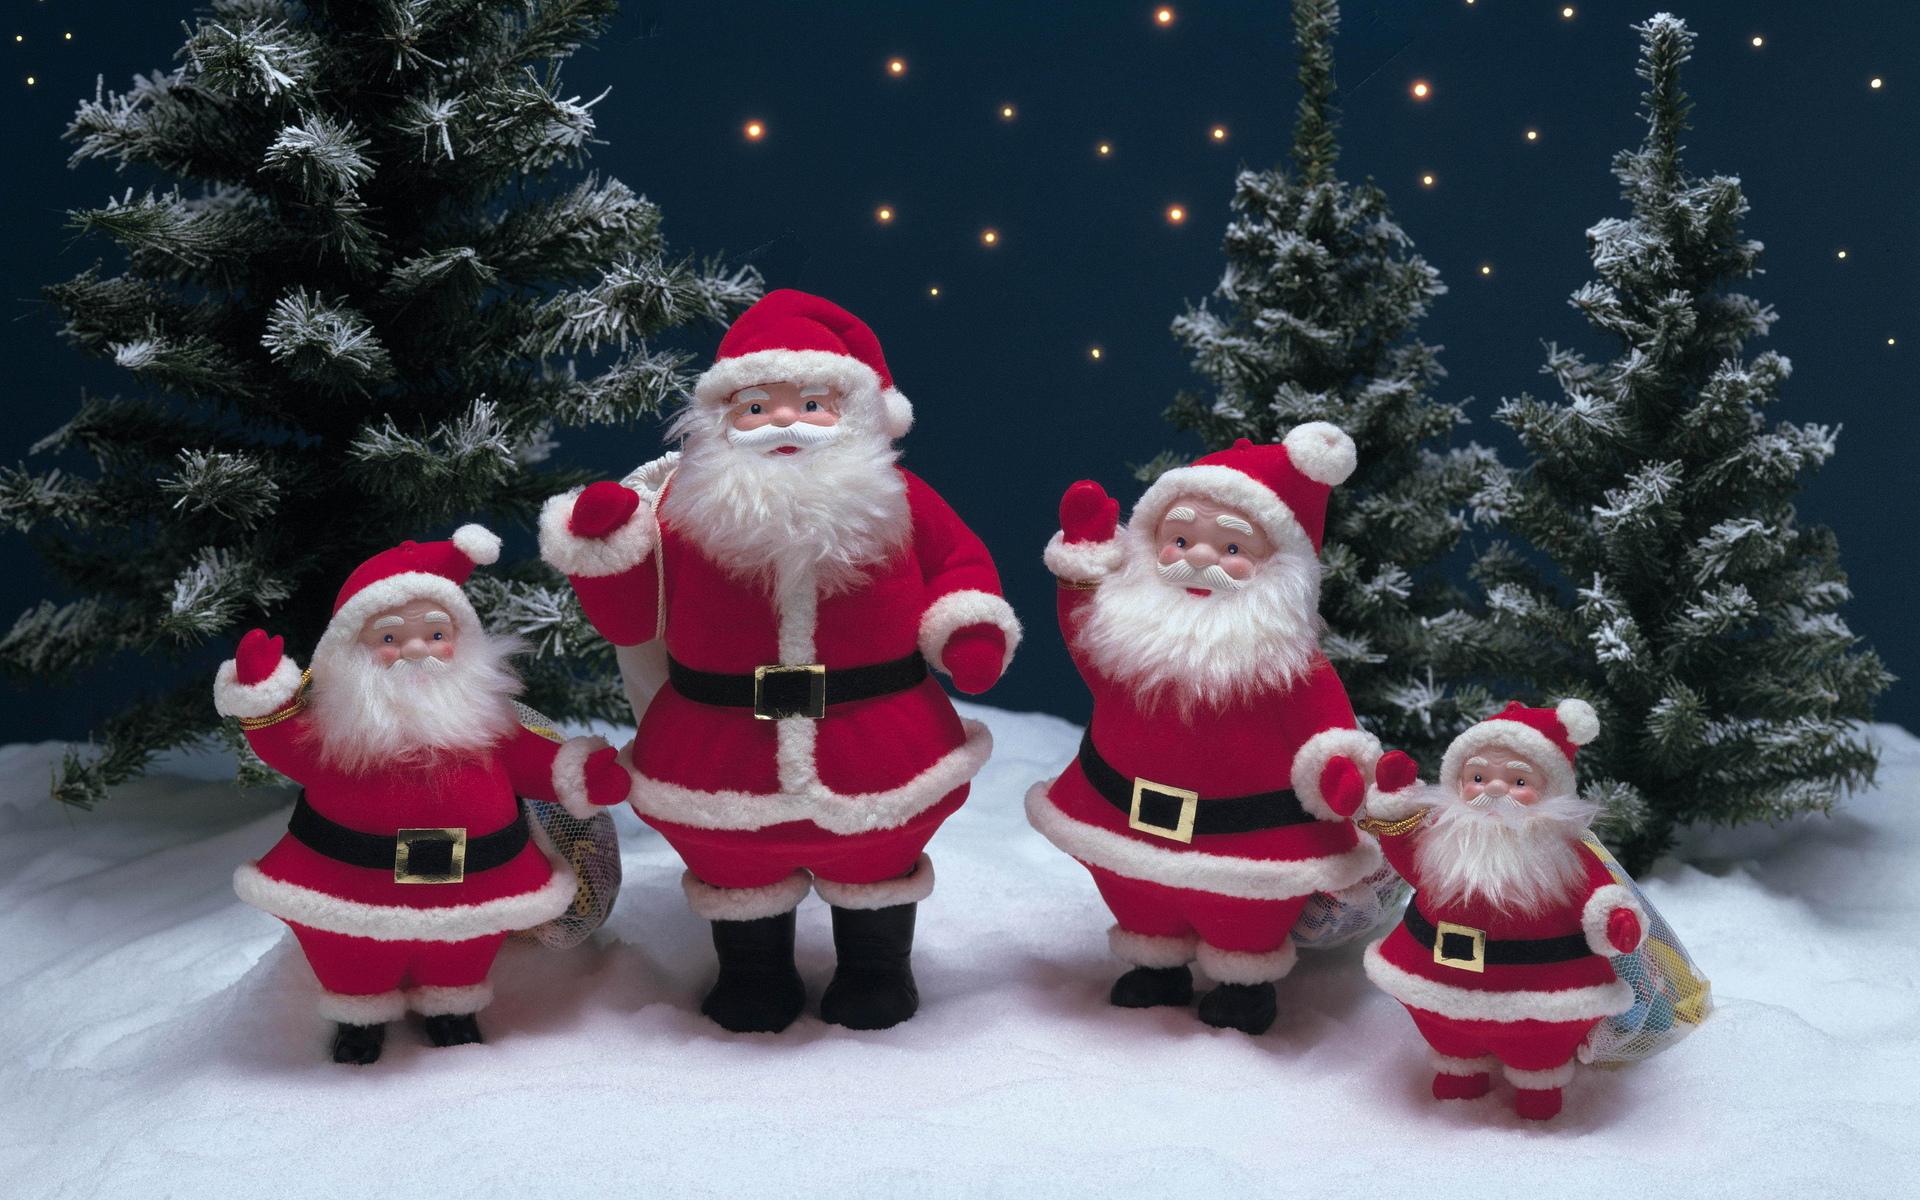 Christmas decorations snow tree Santa Claus wallpaper | 1920x1200 ...